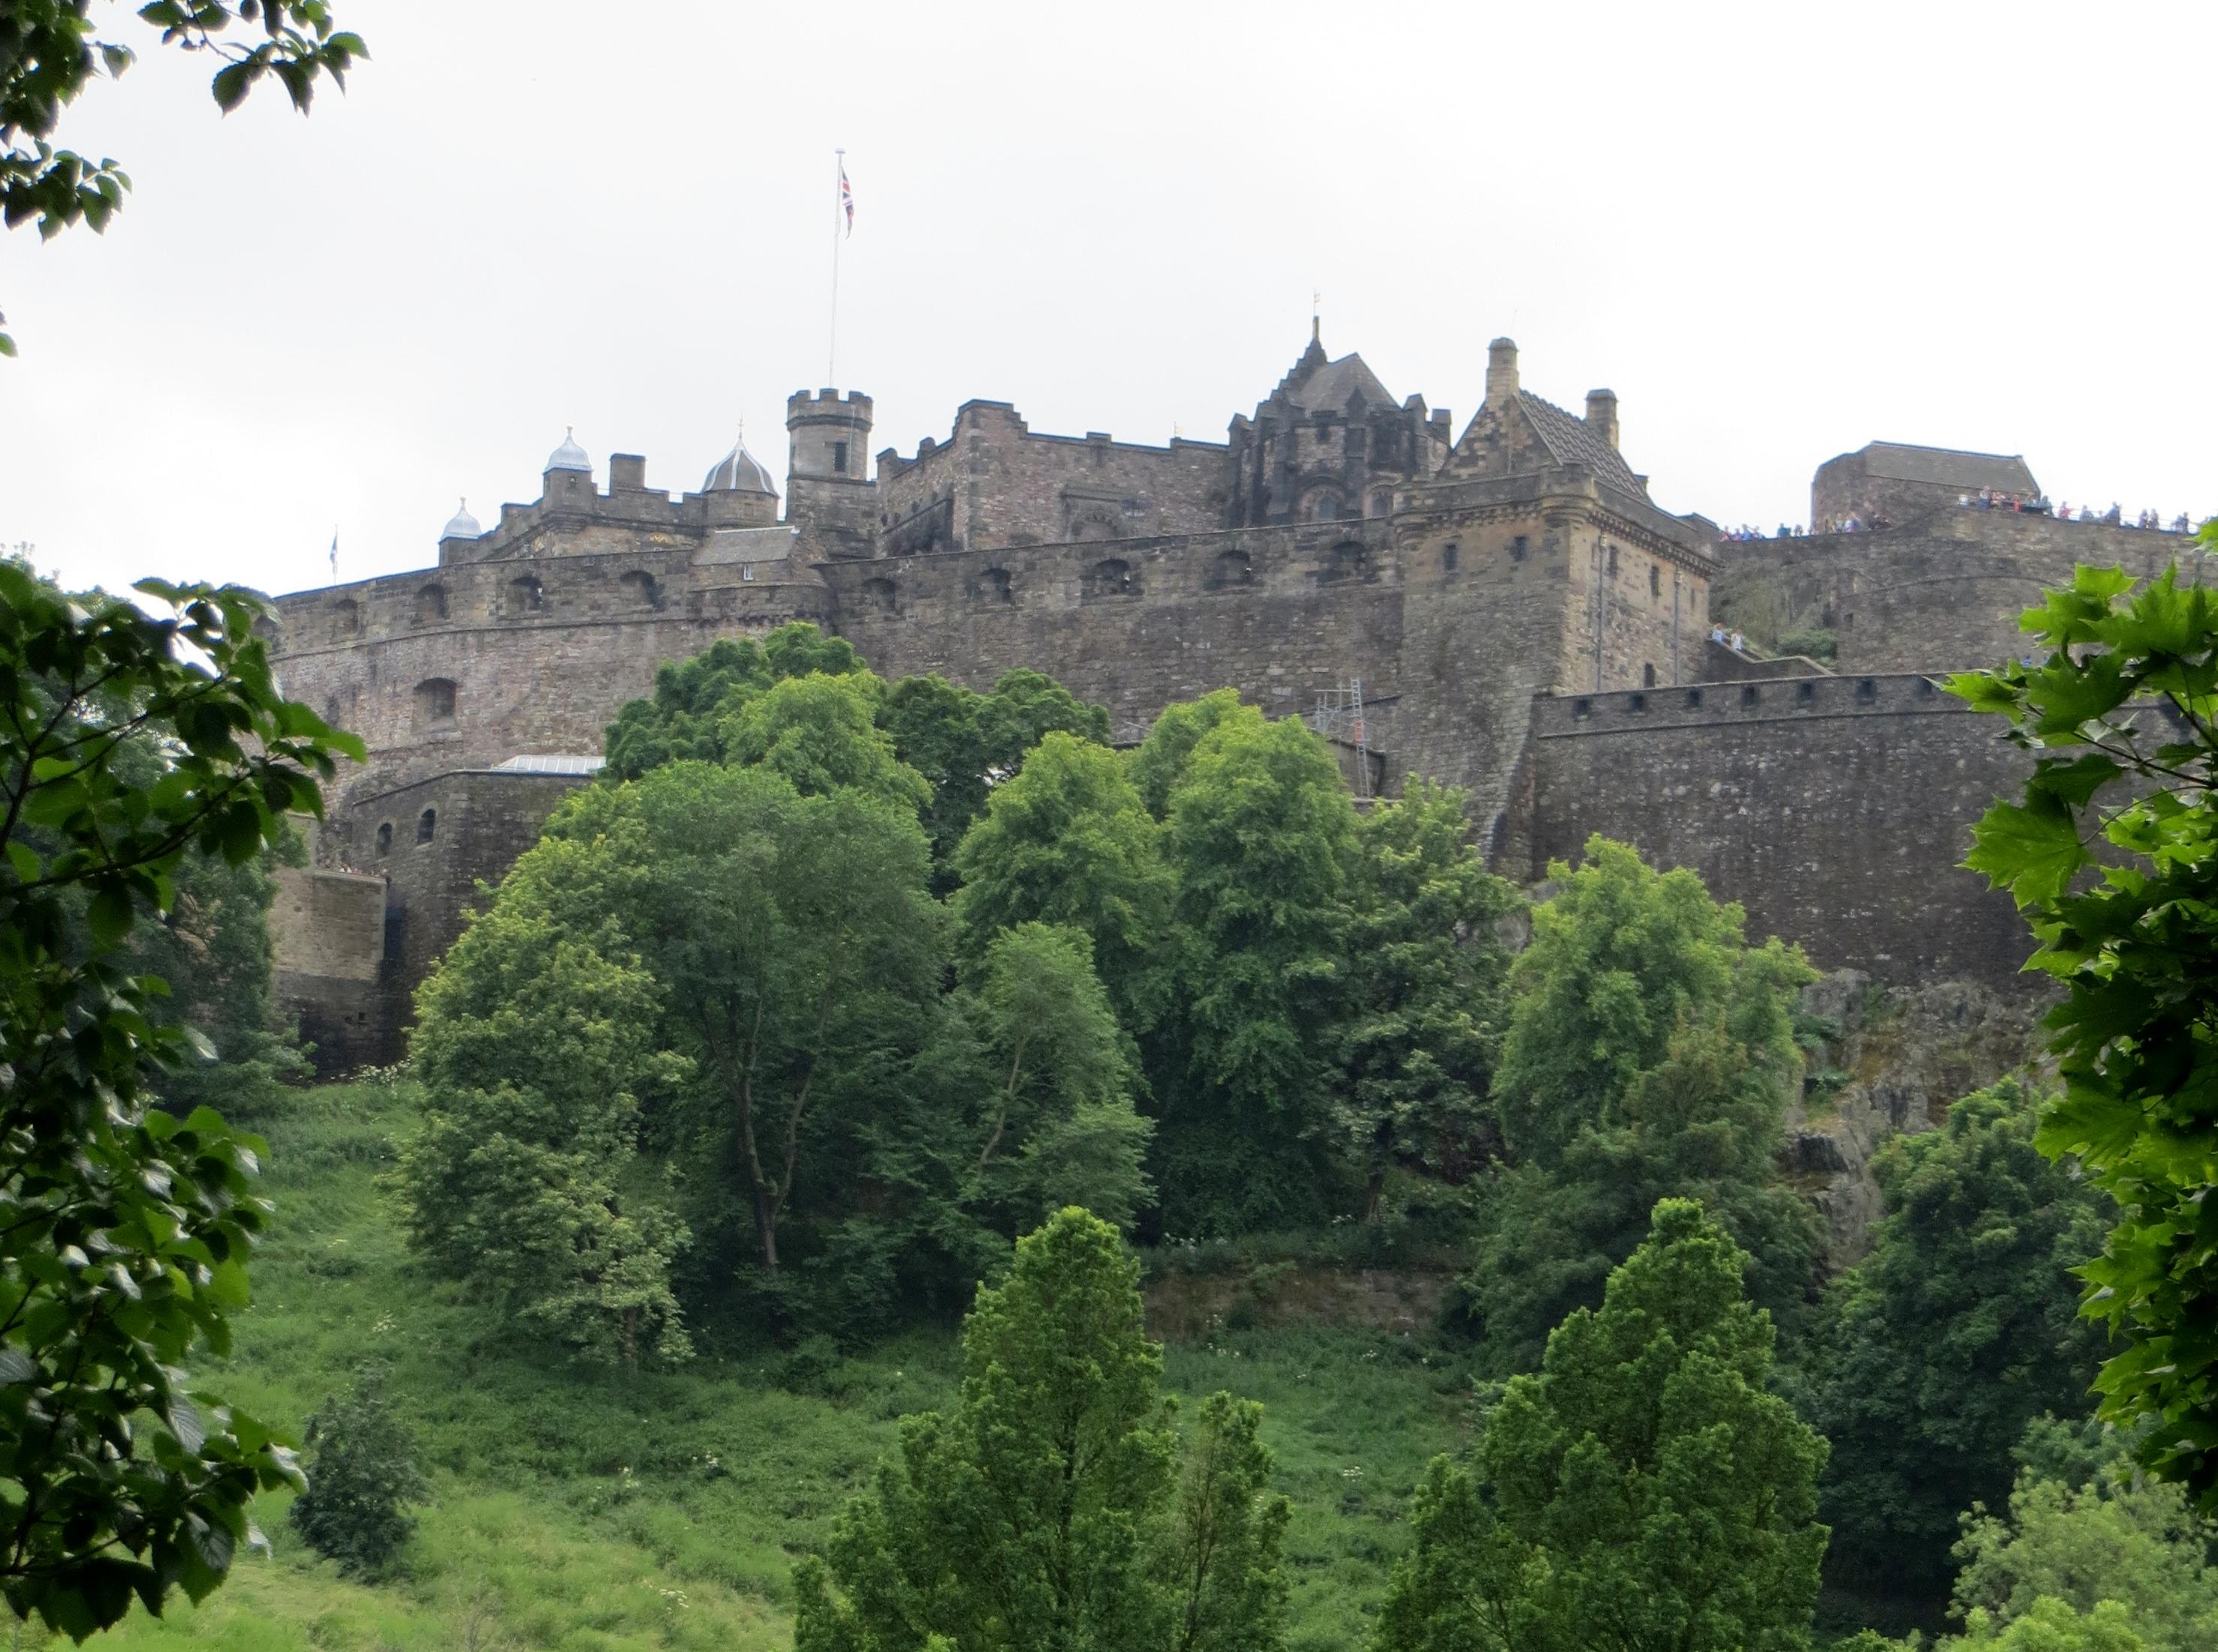 S Queensferry Scotland 7.4 Edinburgh castle best IMG_1334